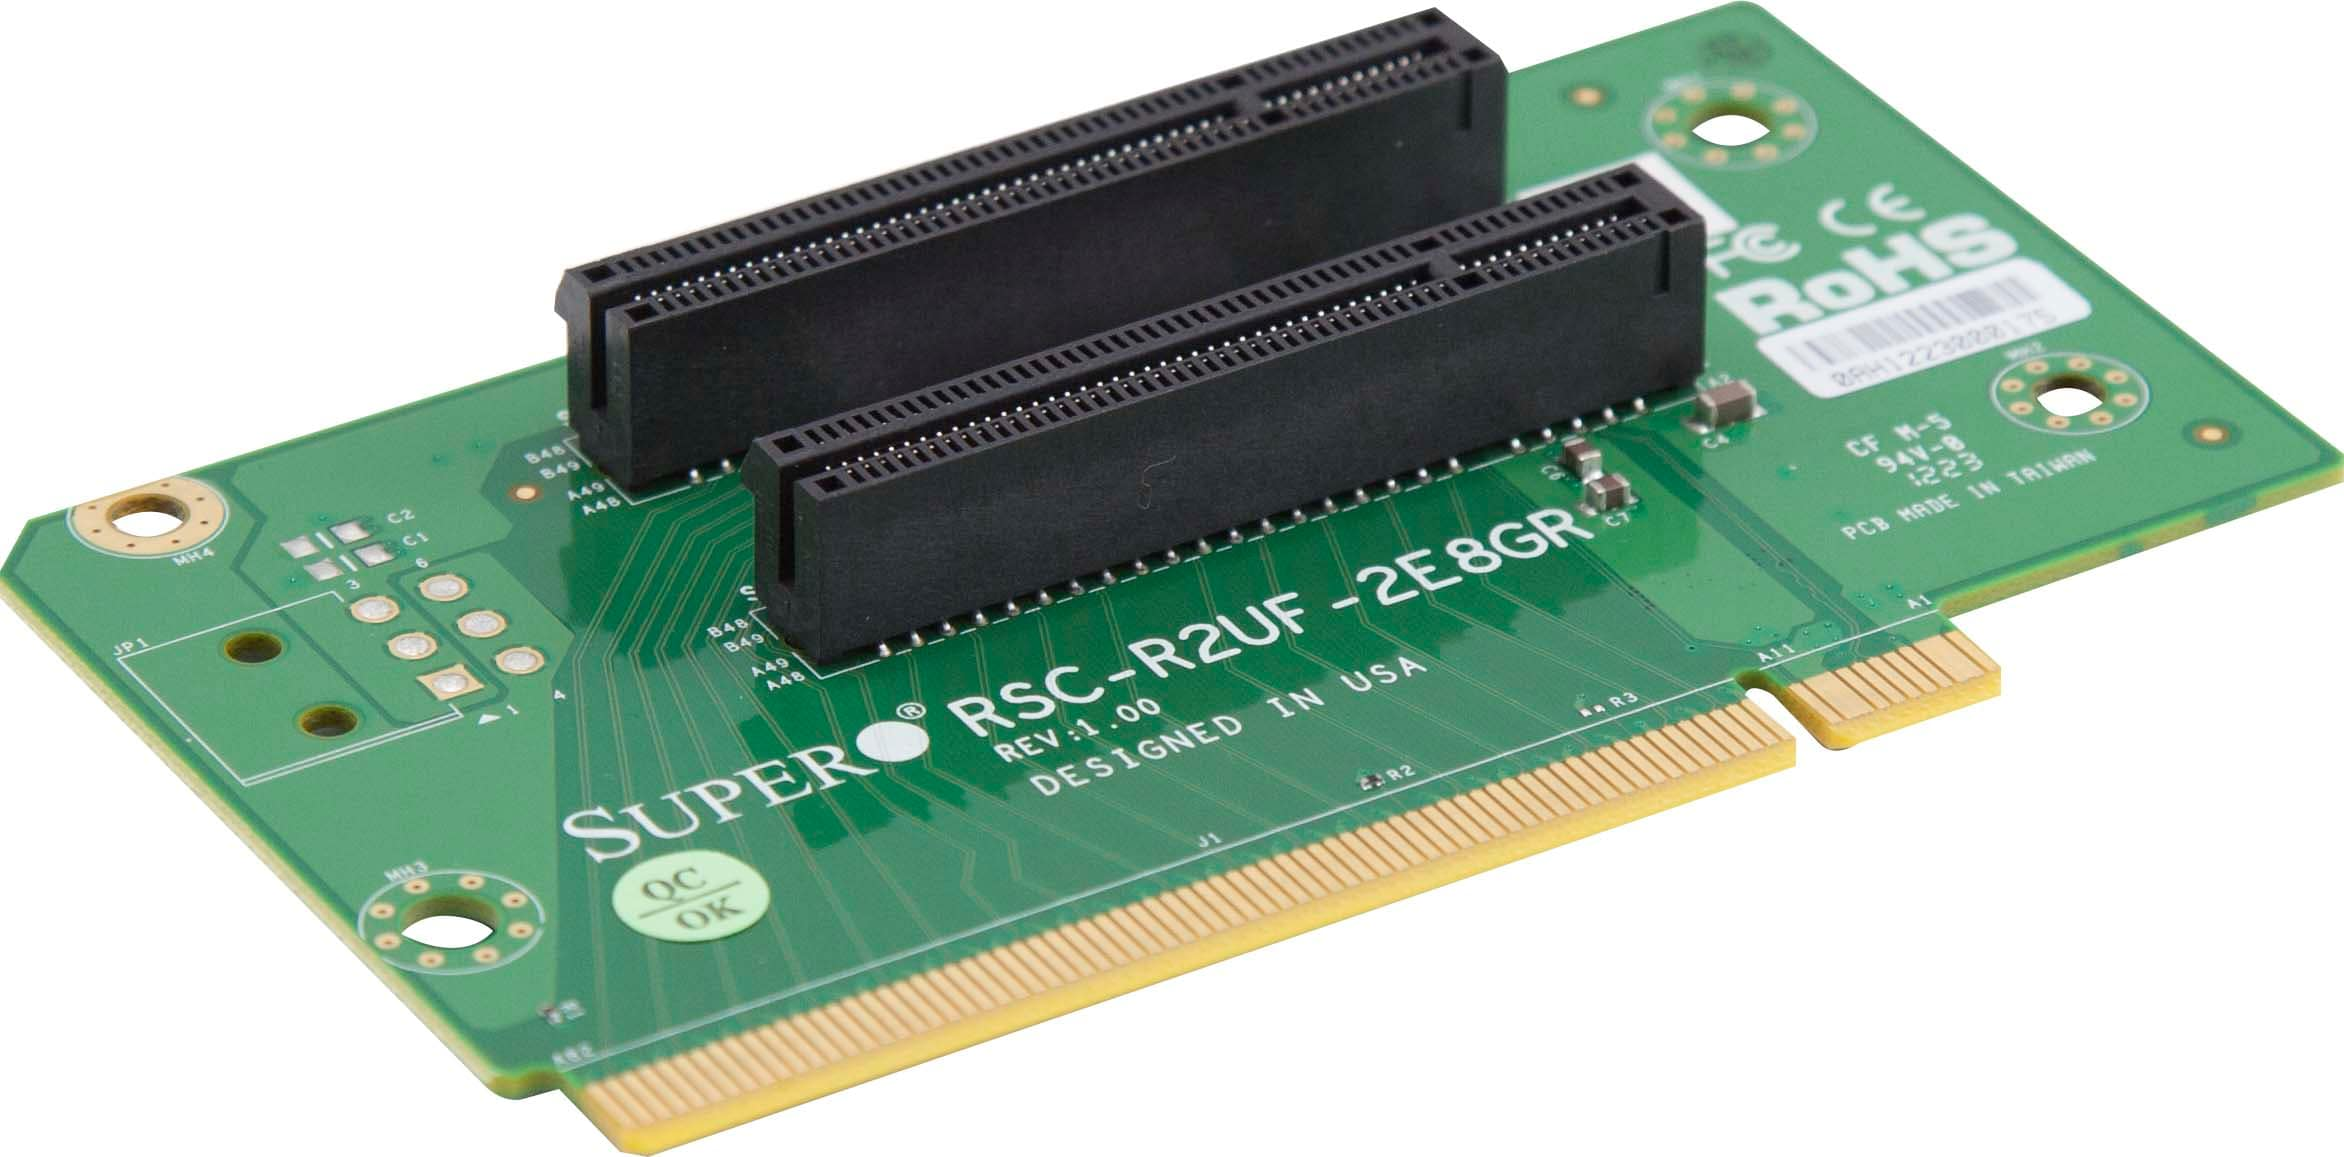 Zdjecie - RSC-R2UF-2E8GR - Supermicro